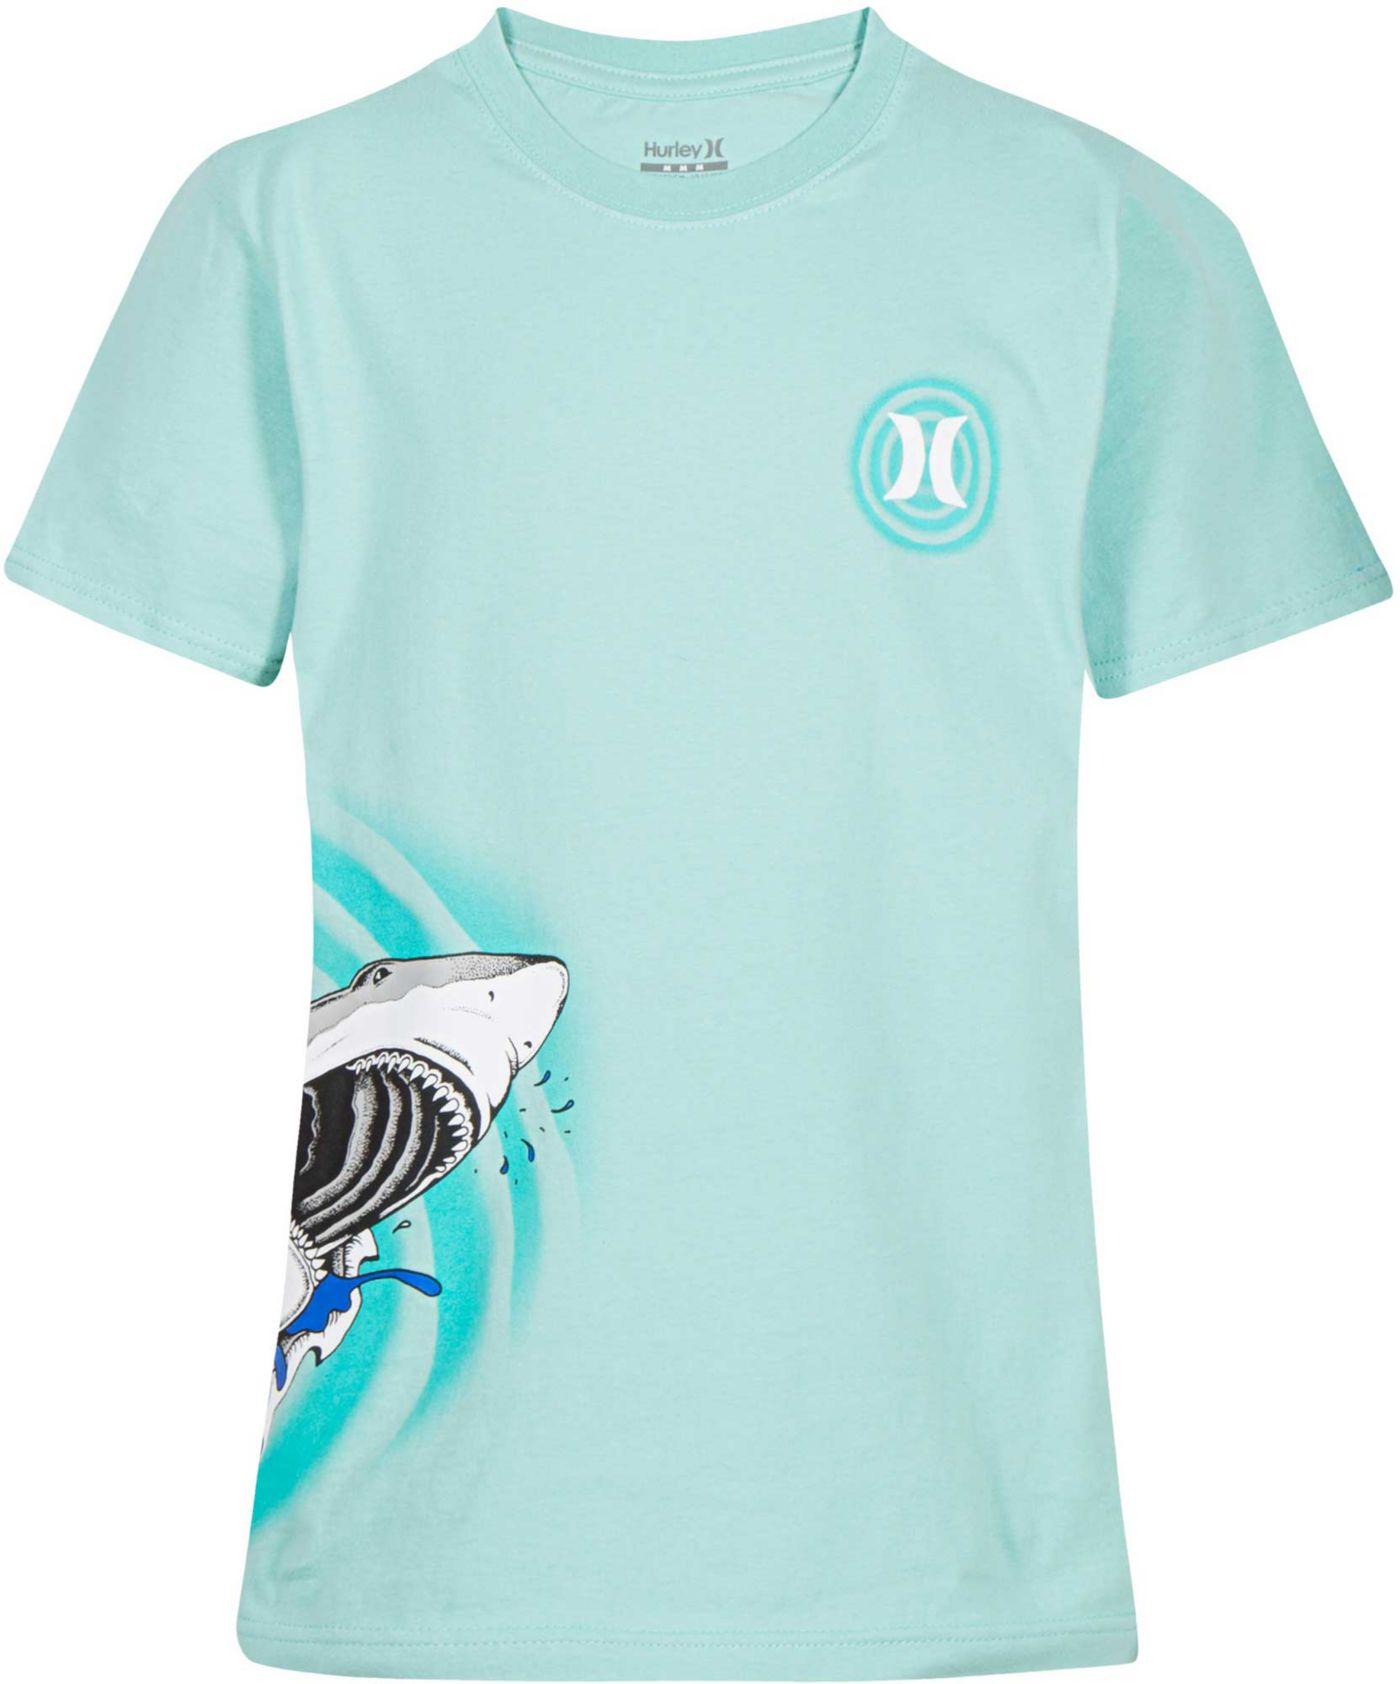 Hurley Boys' Shark Bite Icon Logo Graphic Short Sleeve T-Shirt